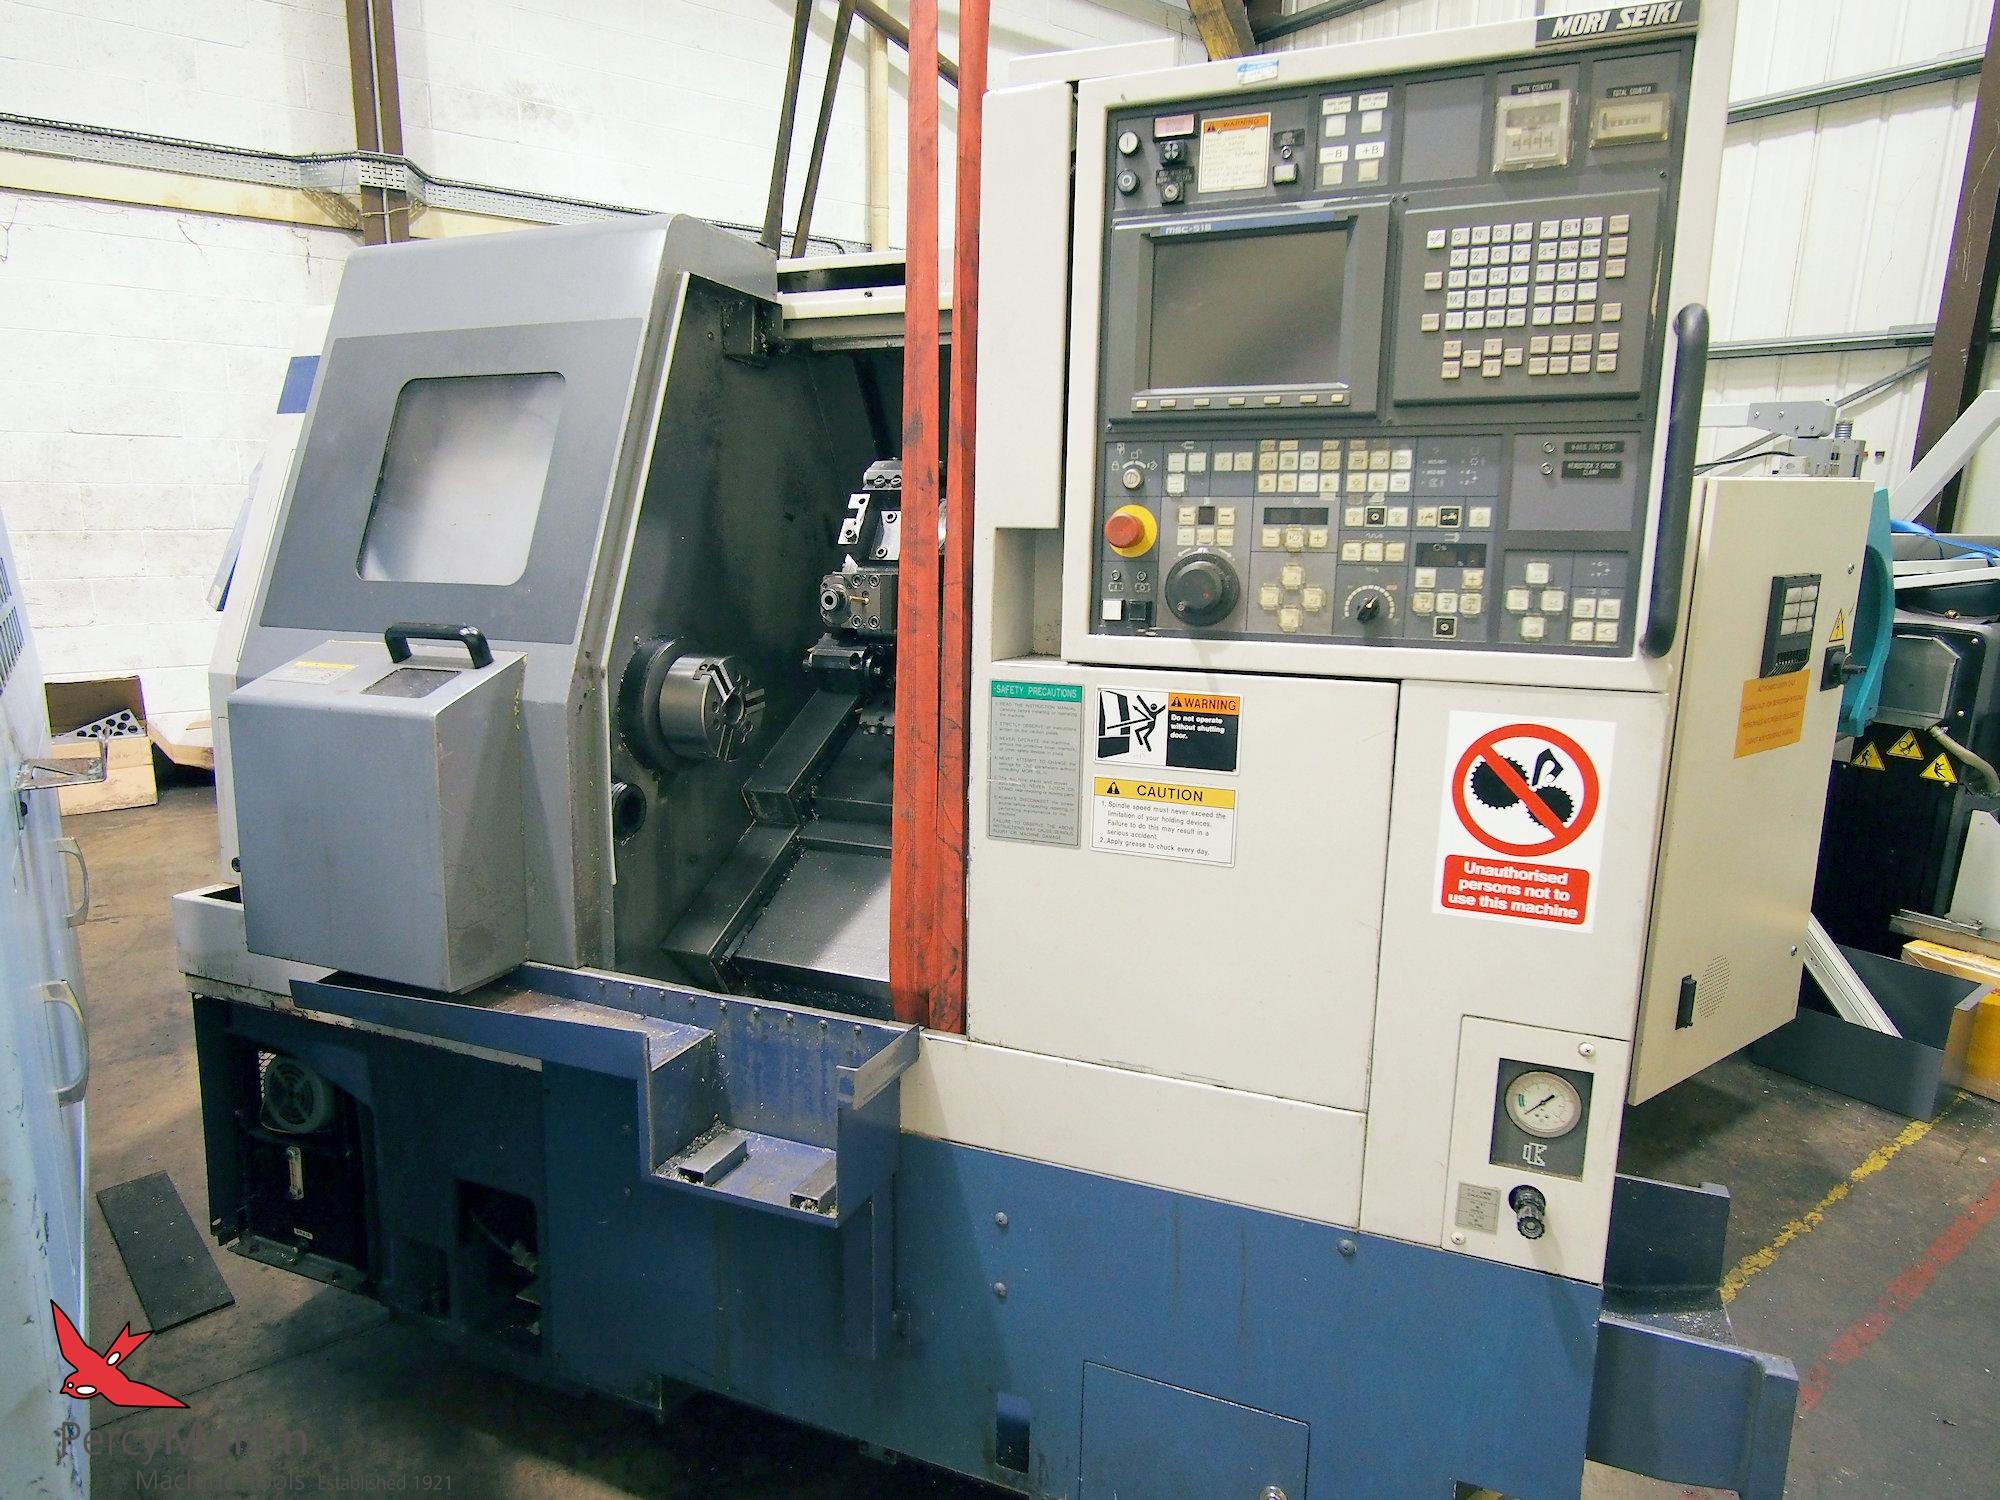 used Mori Seiki SL-150SMC 1996 CNC Lathes with Milling for